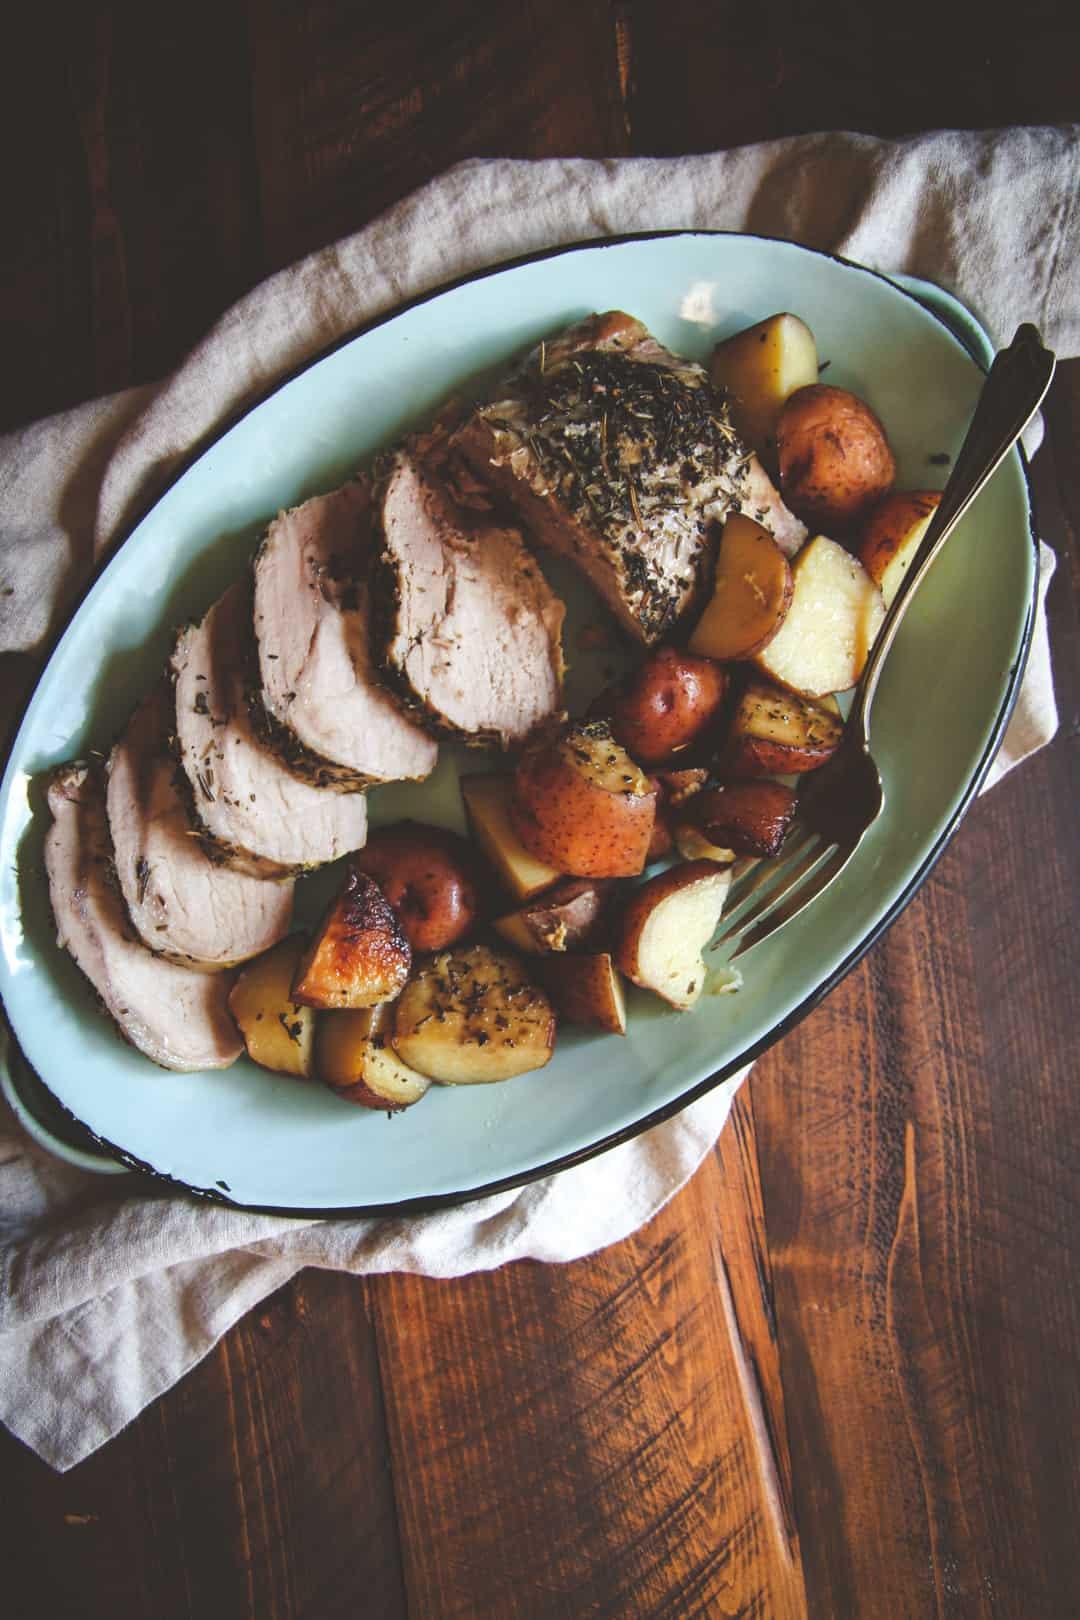 Crockpot Roasted Potatoes  5 Ingre nt Crock Pot Pork Roast and Potatoes Recipe